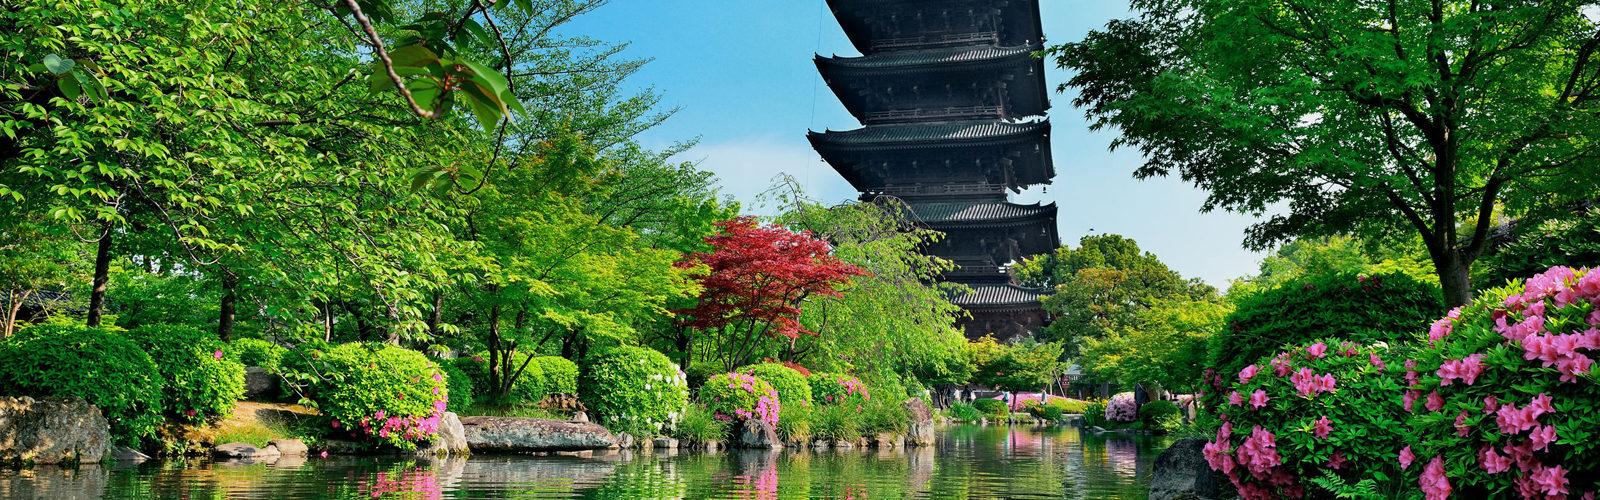 Japan's Olympic Summer